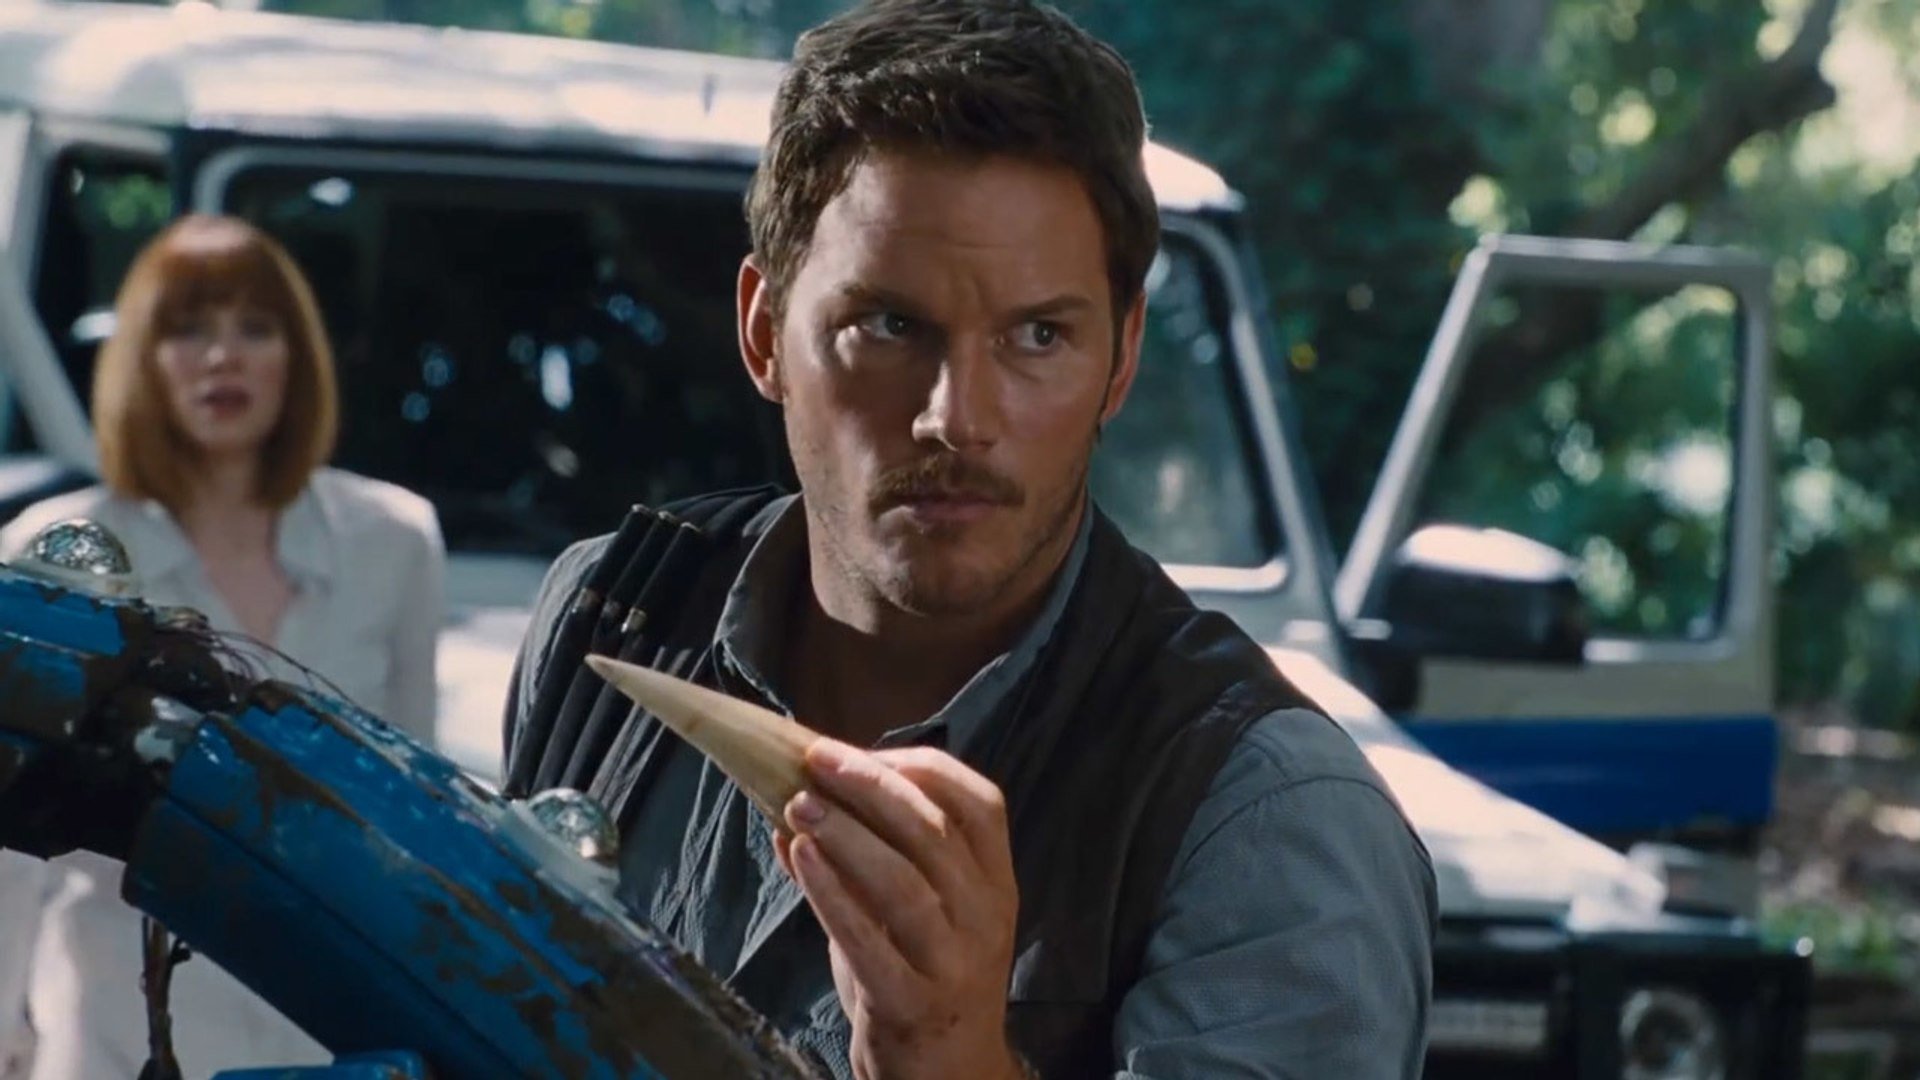 Jurassic World Filmi olarak Izle Watch Full Movie